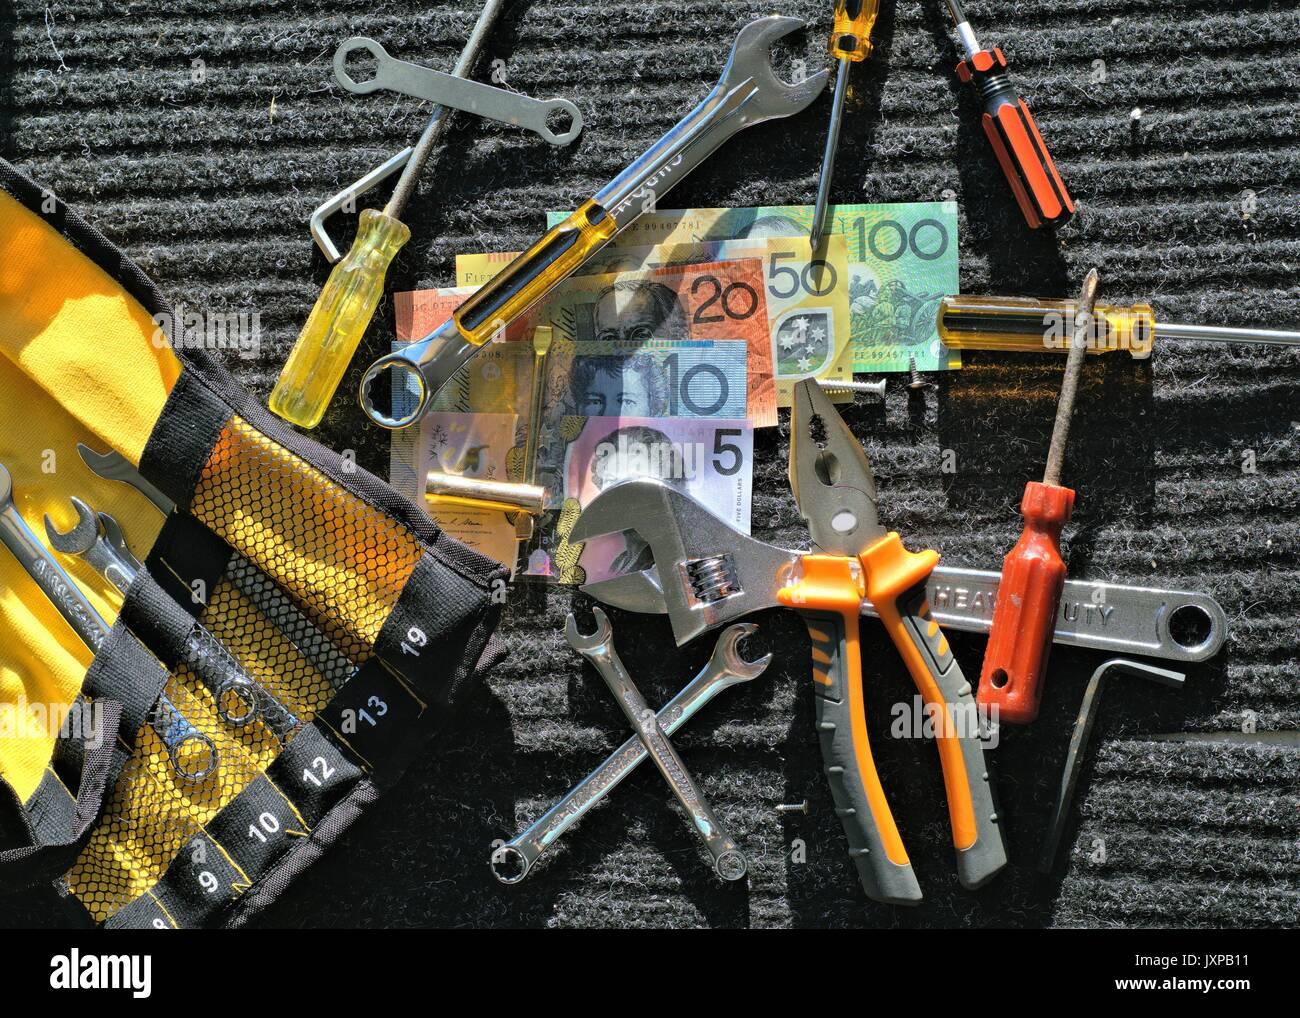 Australian money and tools of mechanic on black mat in direct sunlight Stock Photo